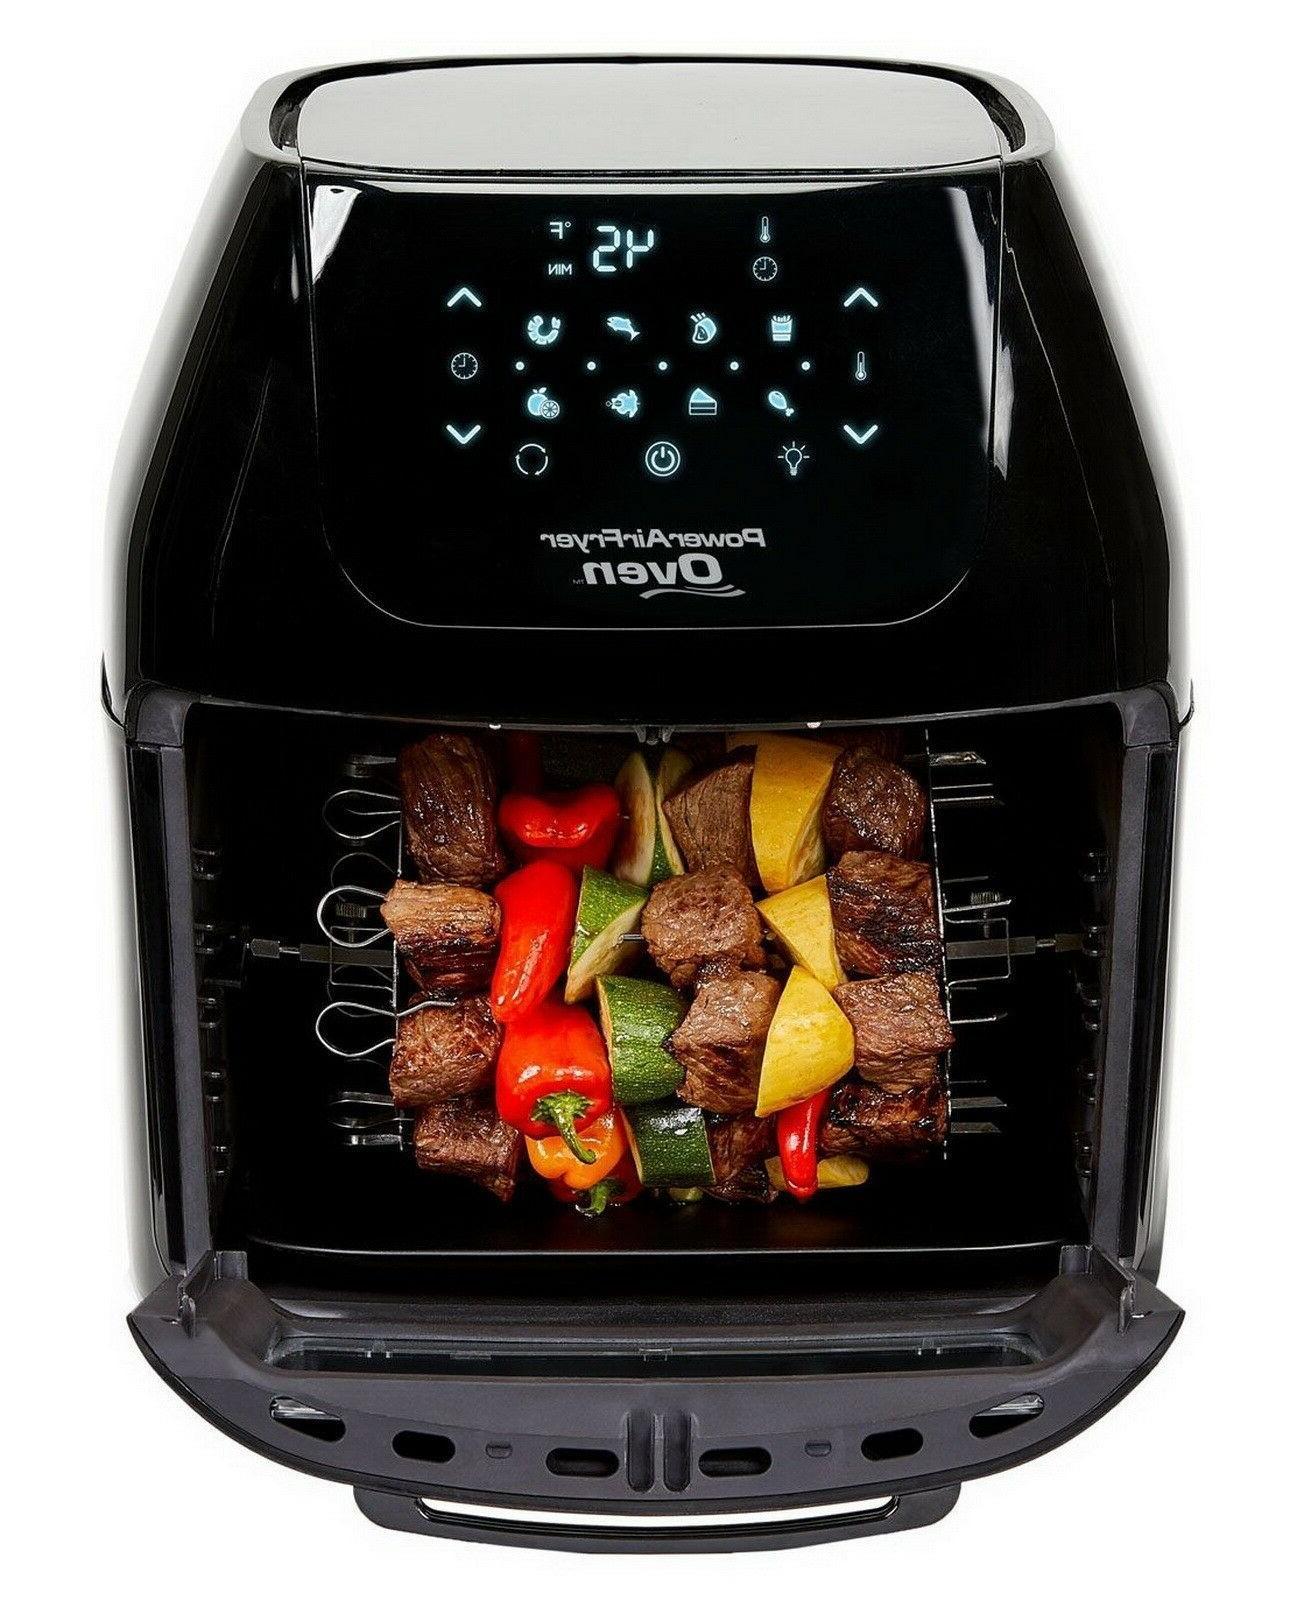 Power Oven 7-in-1 Multi Cooker Fryer Dehydrator Rotisserie